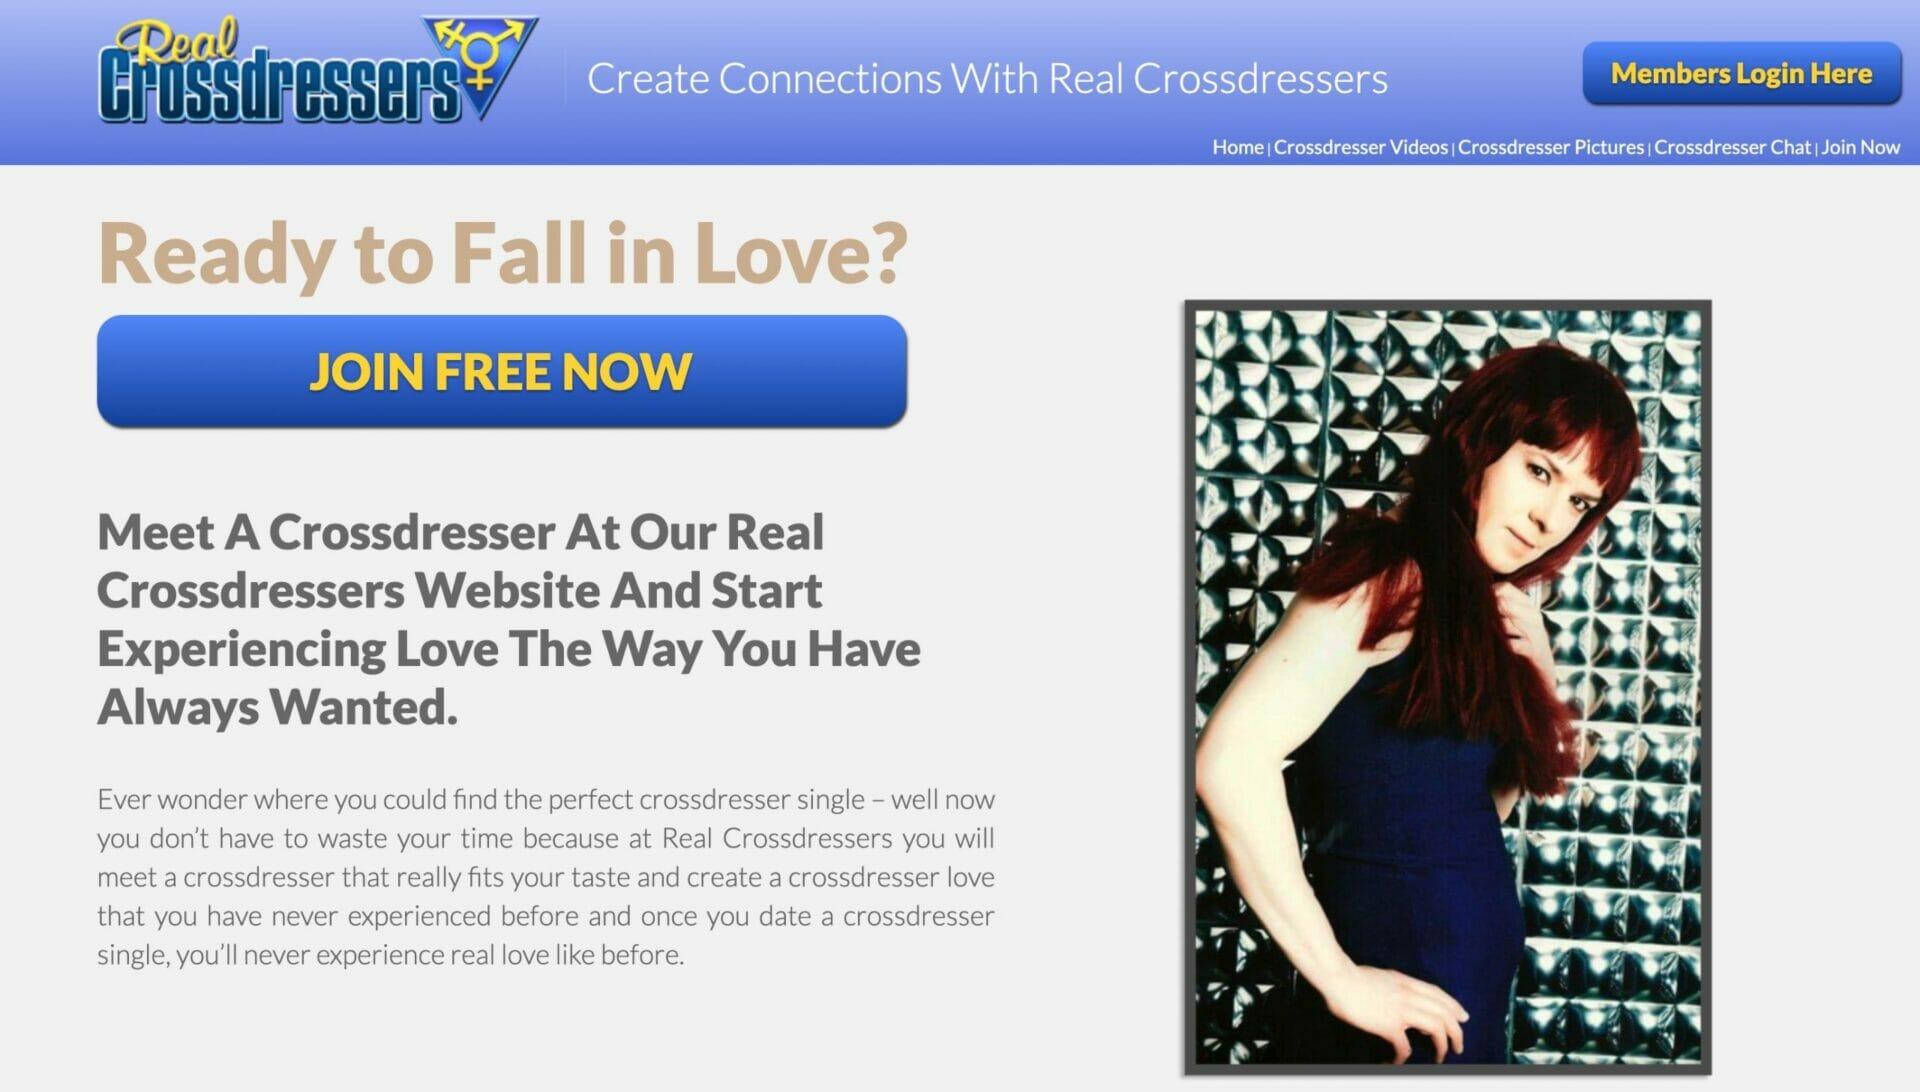 Real Crossdresser main page